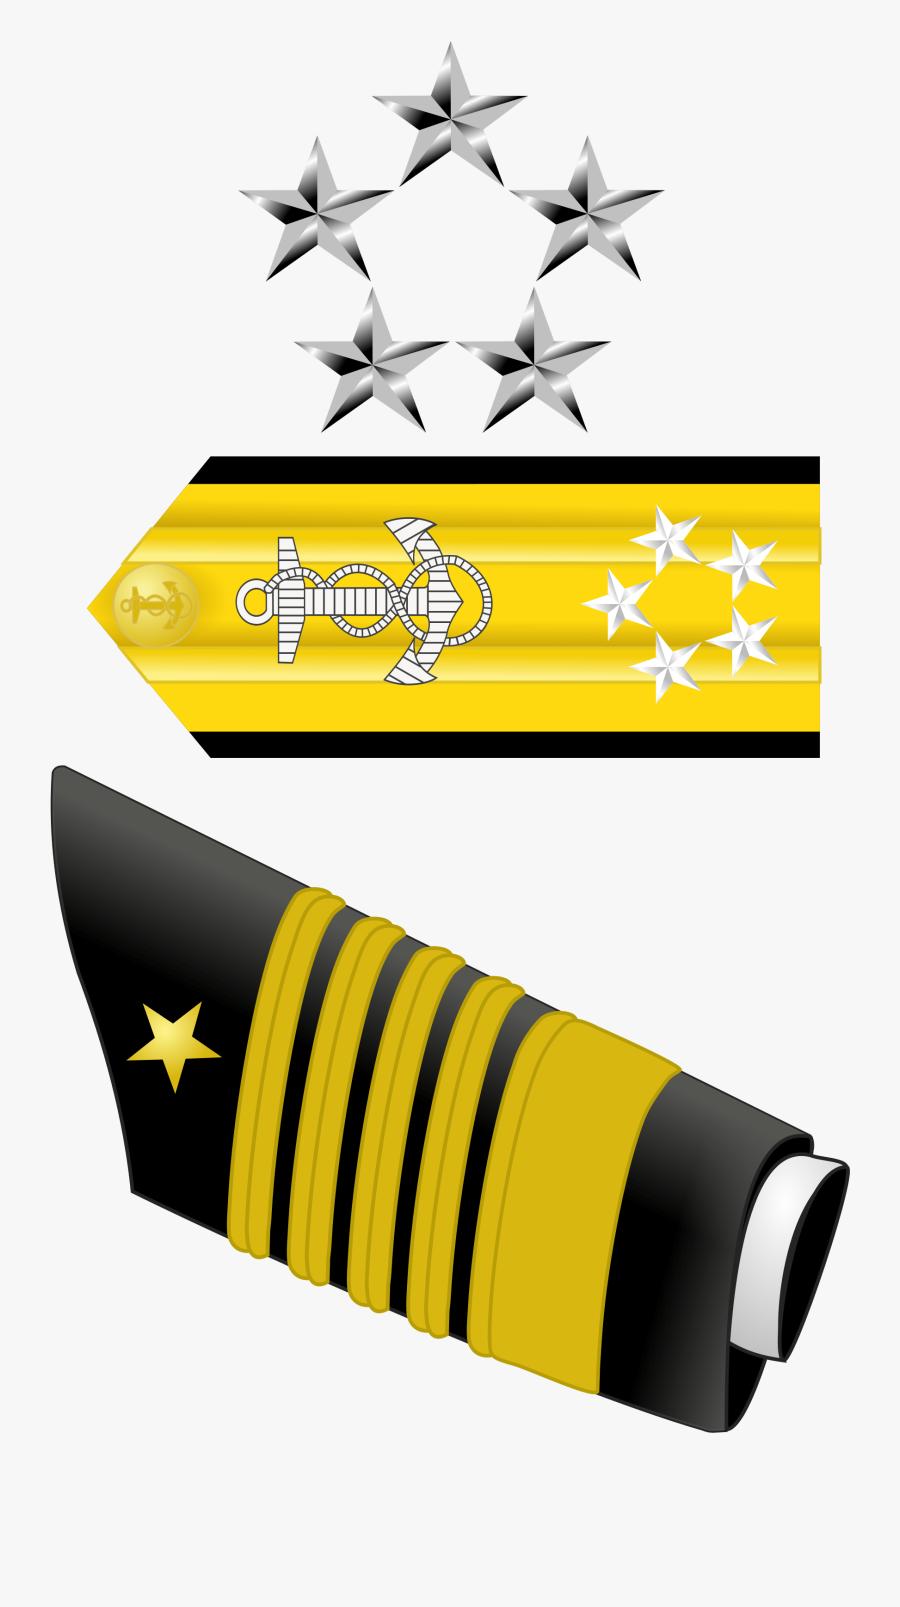 Us Navy Admiral Rank Insignia - Rear Admiral Us Navy Rank, Transparent Clipart